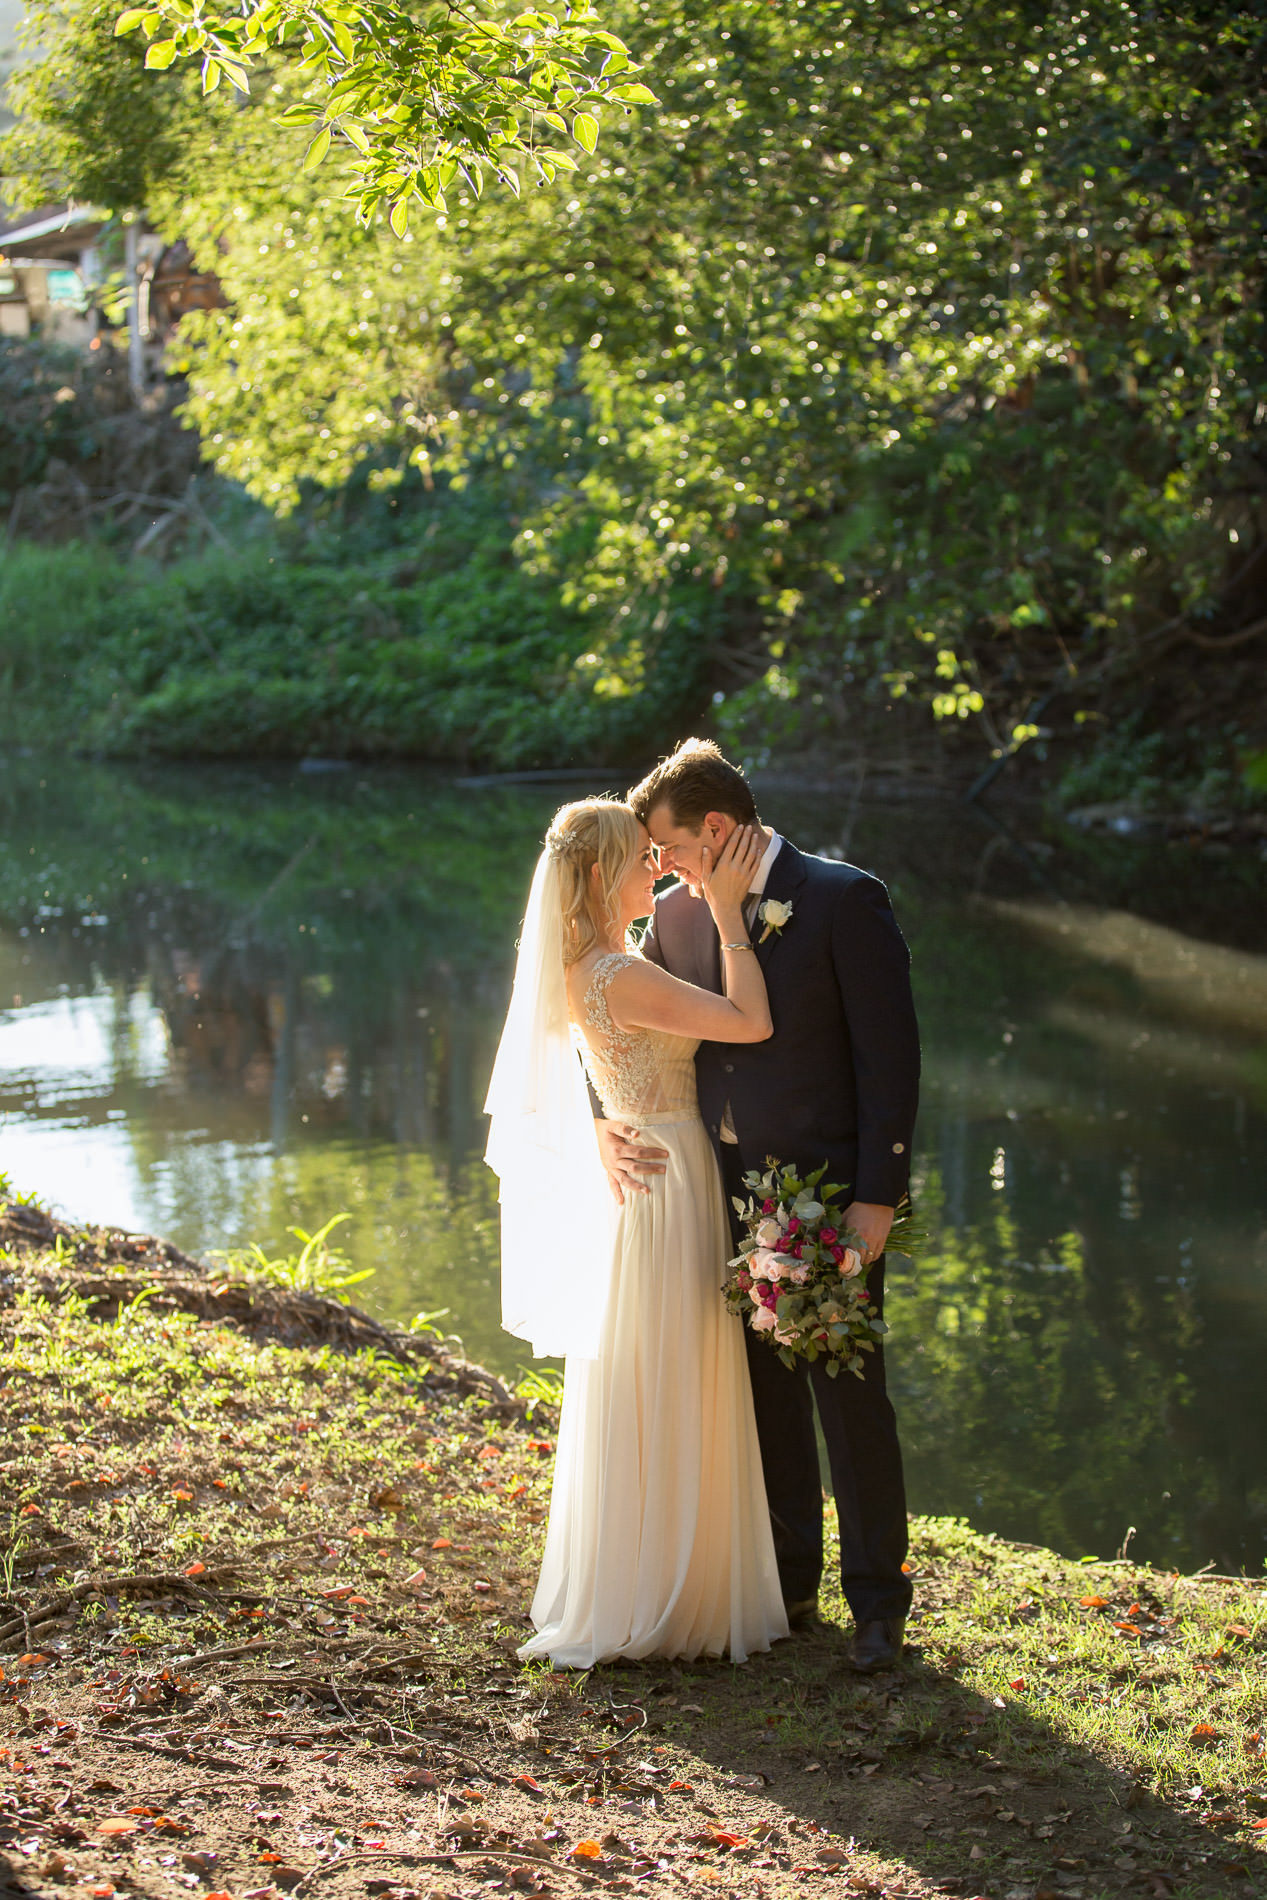 True North Photography_Boomerang Farm_Stacey and Isaac_Gold Coast Wedding_Barm Wedding_Hinterland Wedding-143.jpg